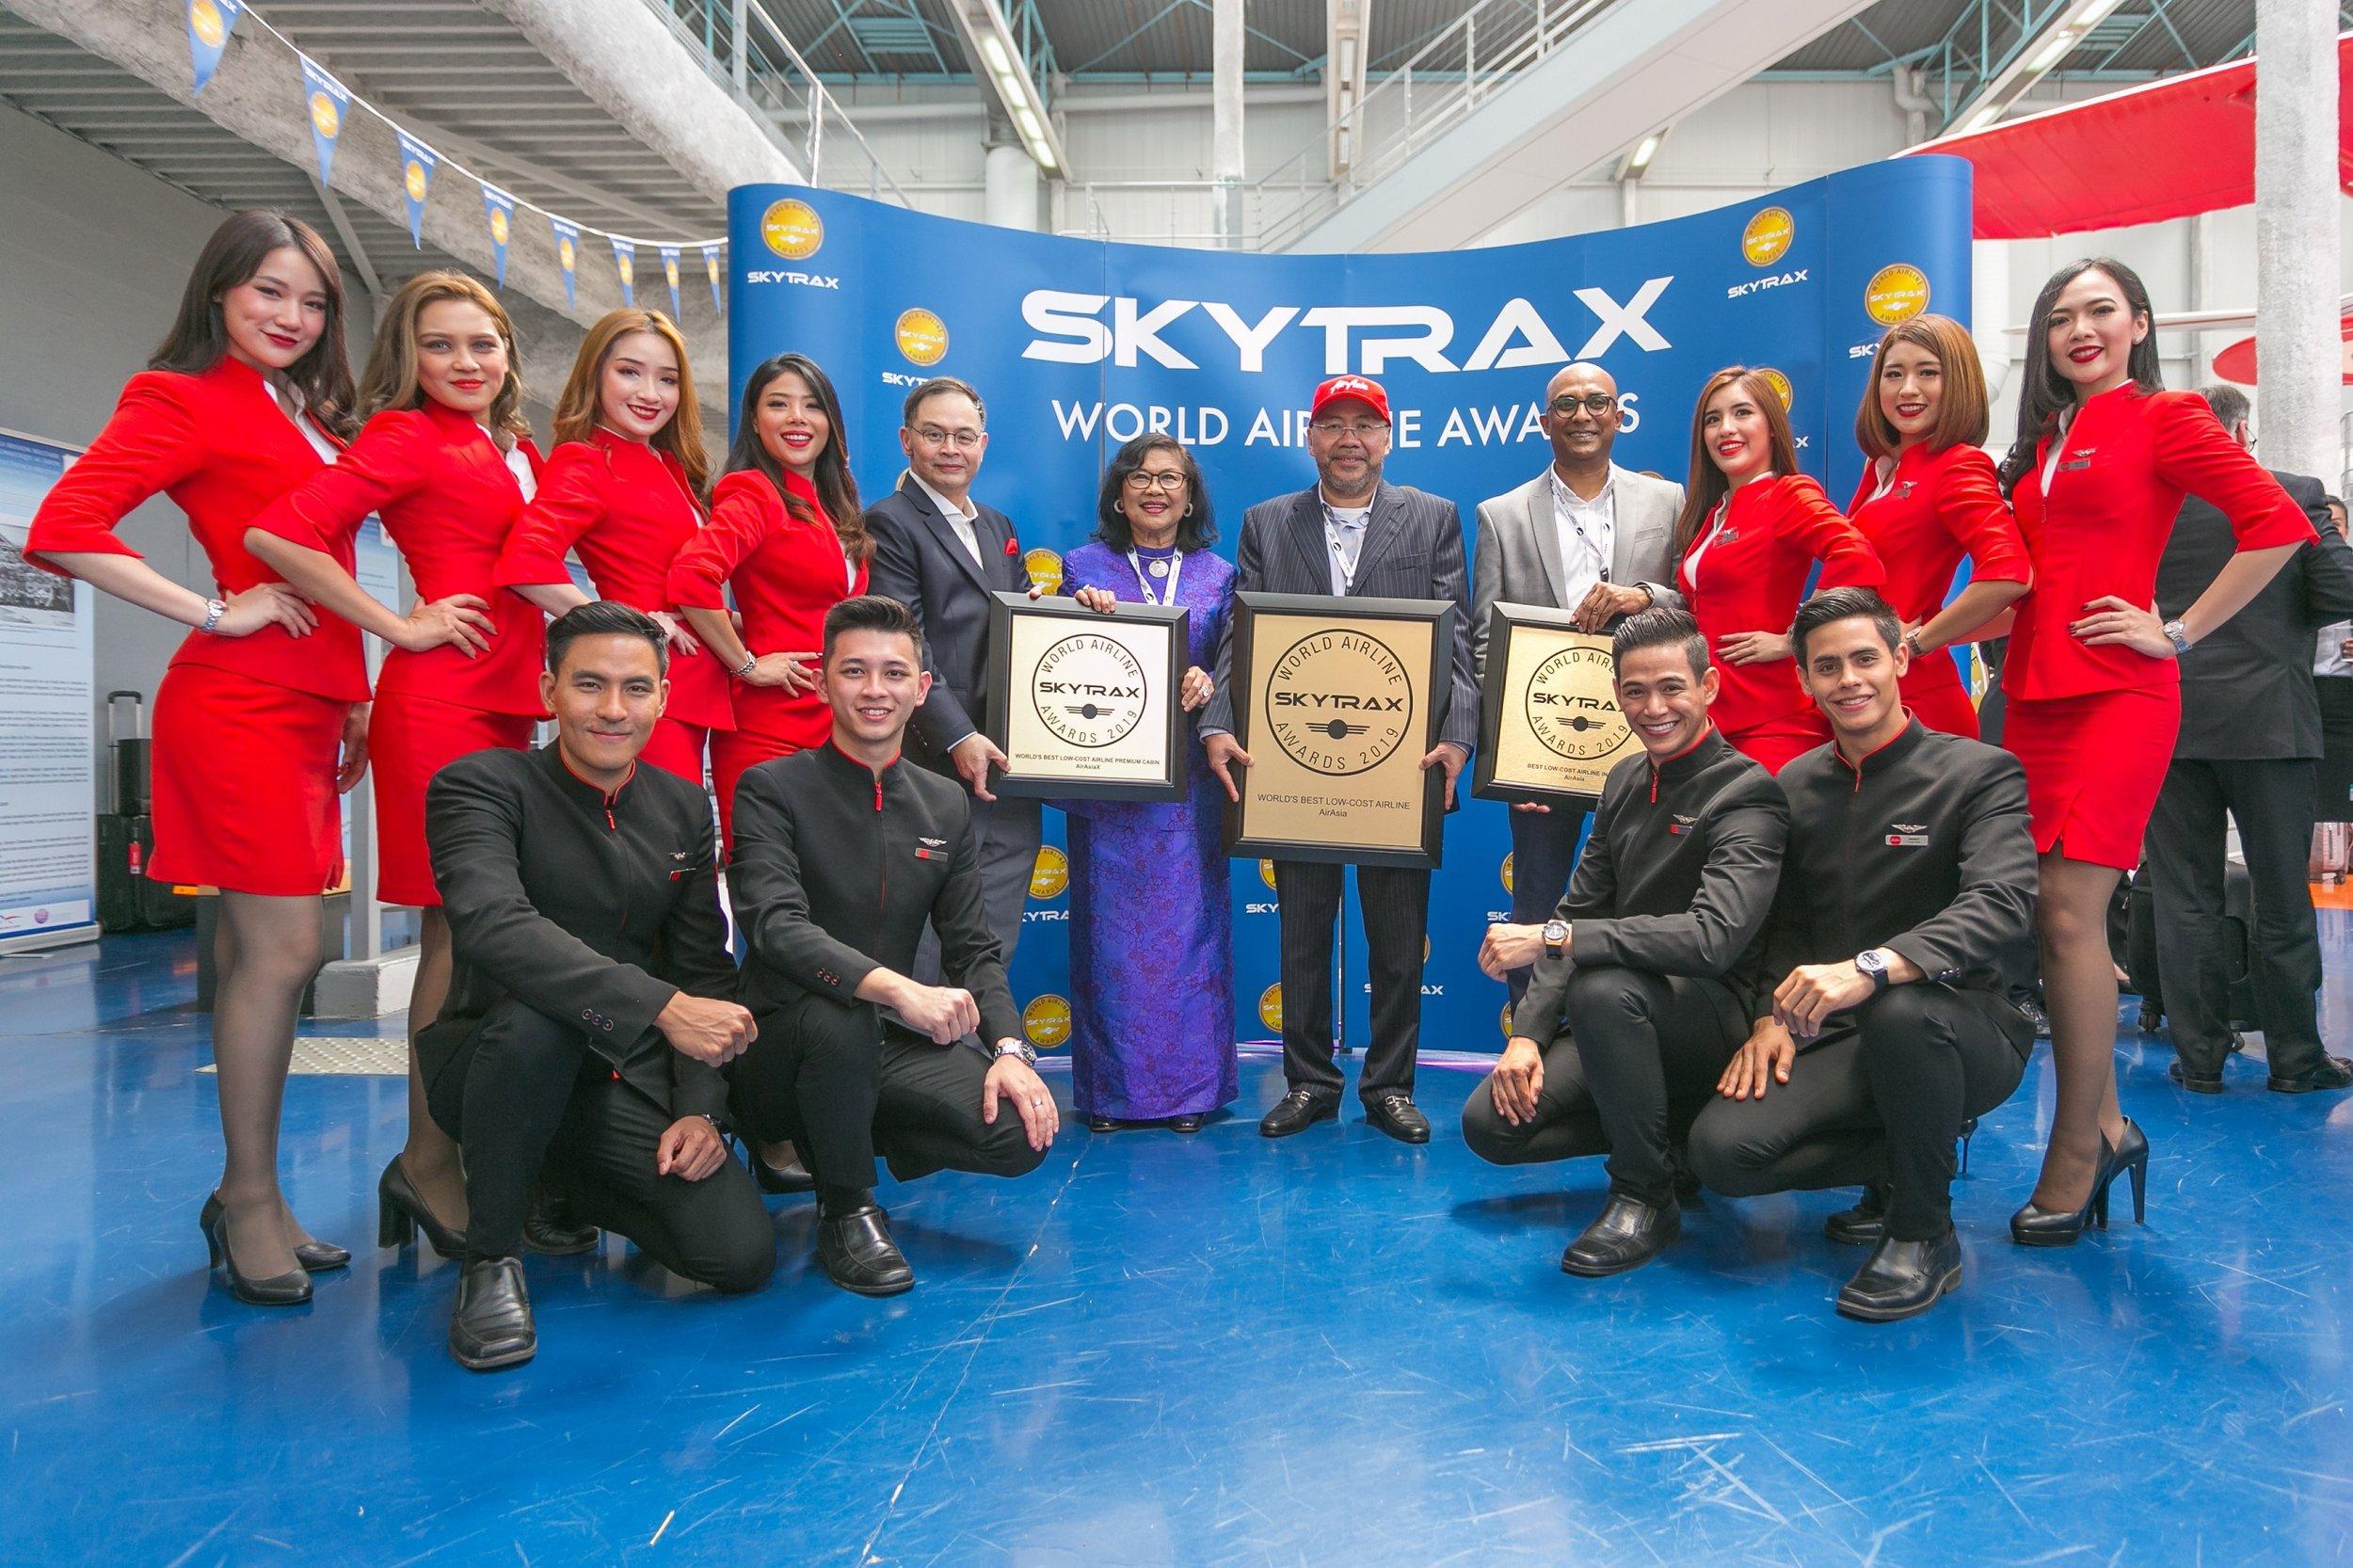 (Kelima dari kiri) Group CEO AirAsia X Nadda Buranasiri, Chairman AirAsia X Berhad Tan Sri Rafidah Aziz, Executive Chairman AirAsia Group Berhad Datuk Kamarudin Meranun, Deputy Group CEO (Airlines) AirAsia Bo Lingam berfoto bersama awak kabin AirAsia